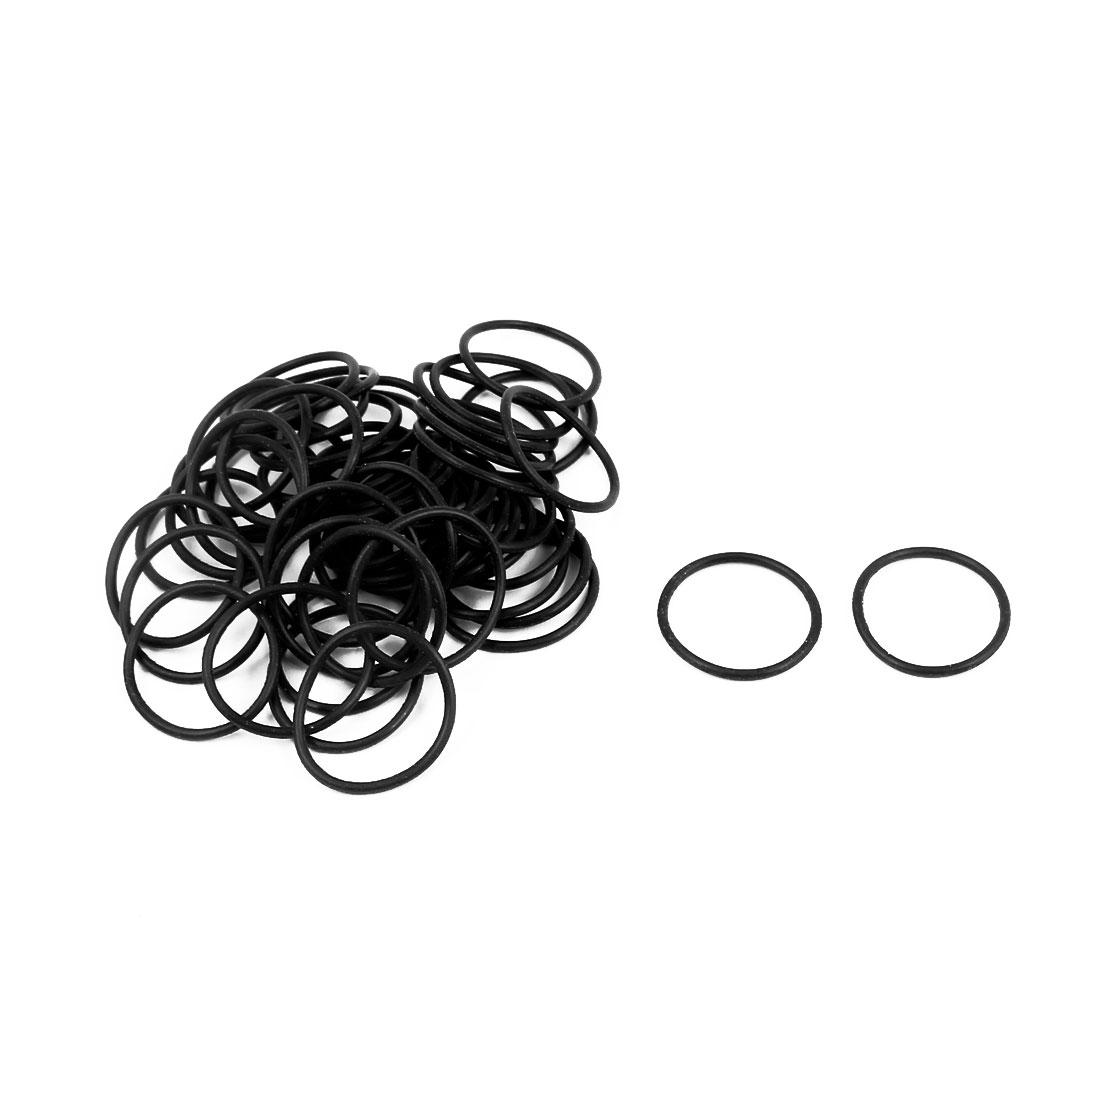 50Pcs Black 18mm x 1.2mm Nitrile Rubber O Ring NBR Oil Sealing Grommets